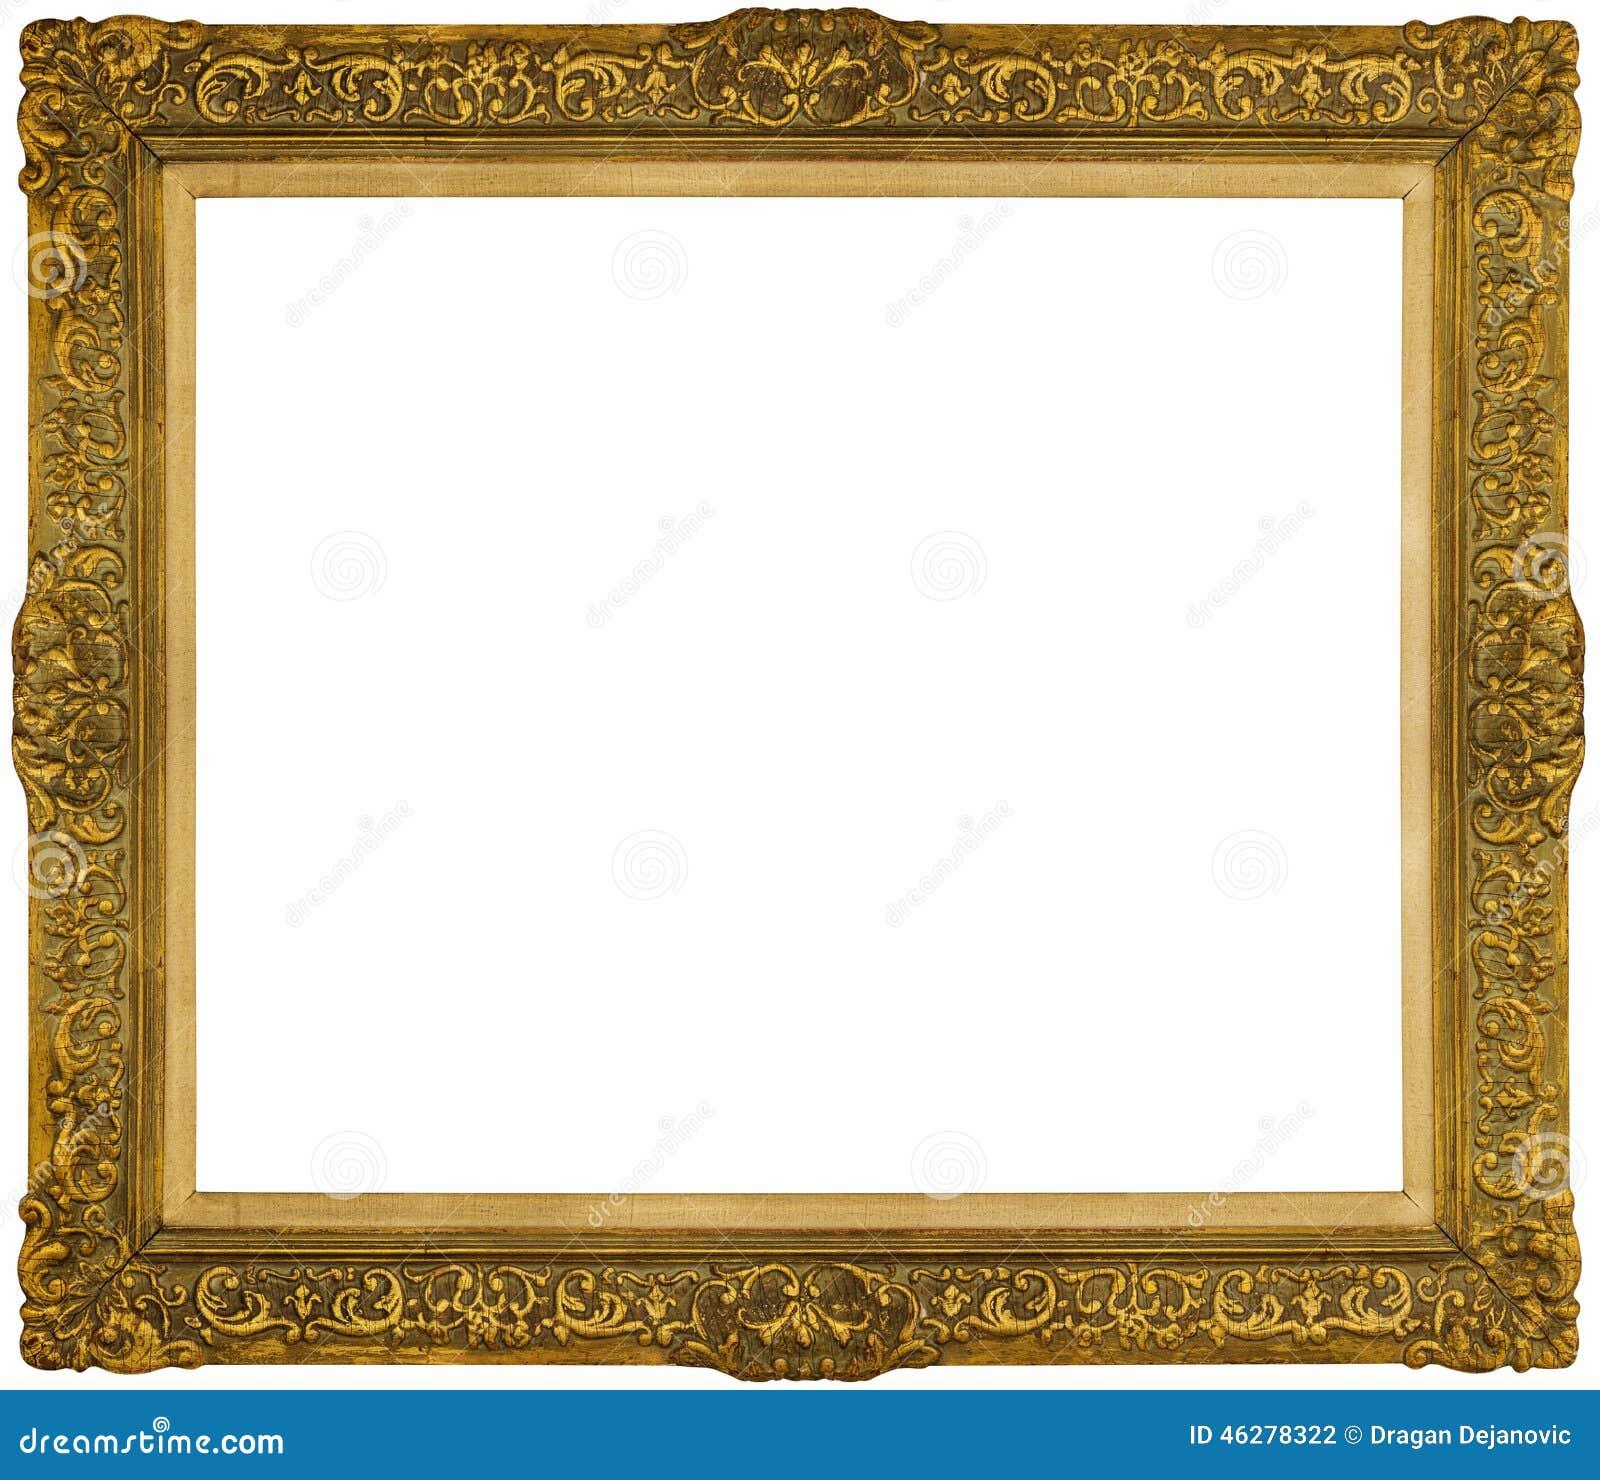 gold baroque frame isolated on white background stock photo image